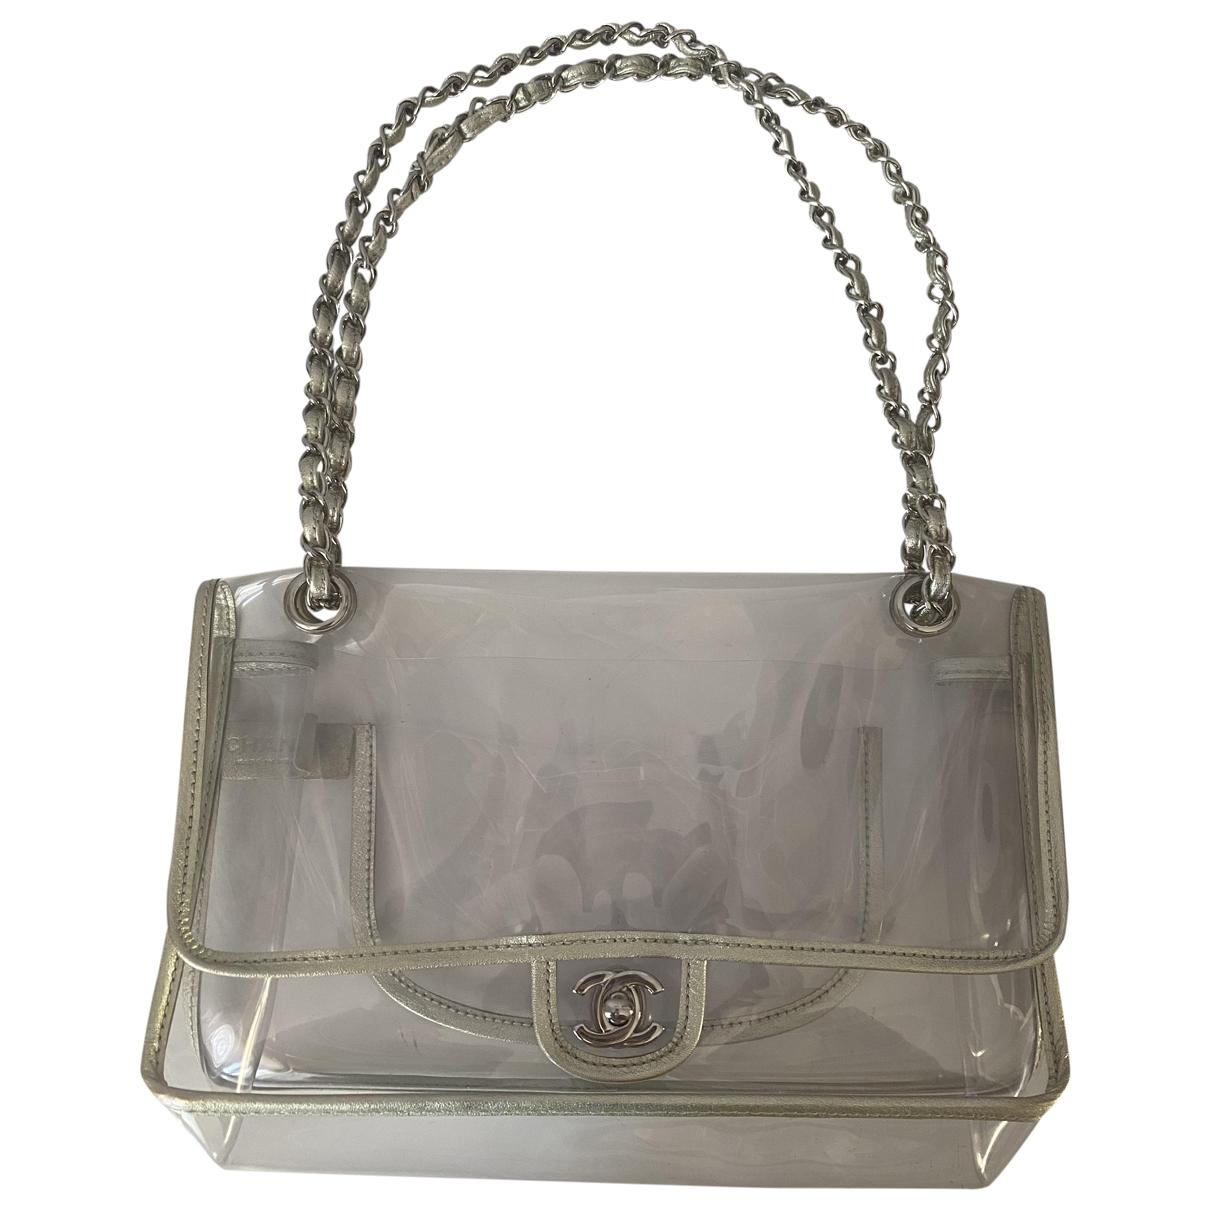 Chanel Timeless/Classique Handtasche in  Silber Kunststoff